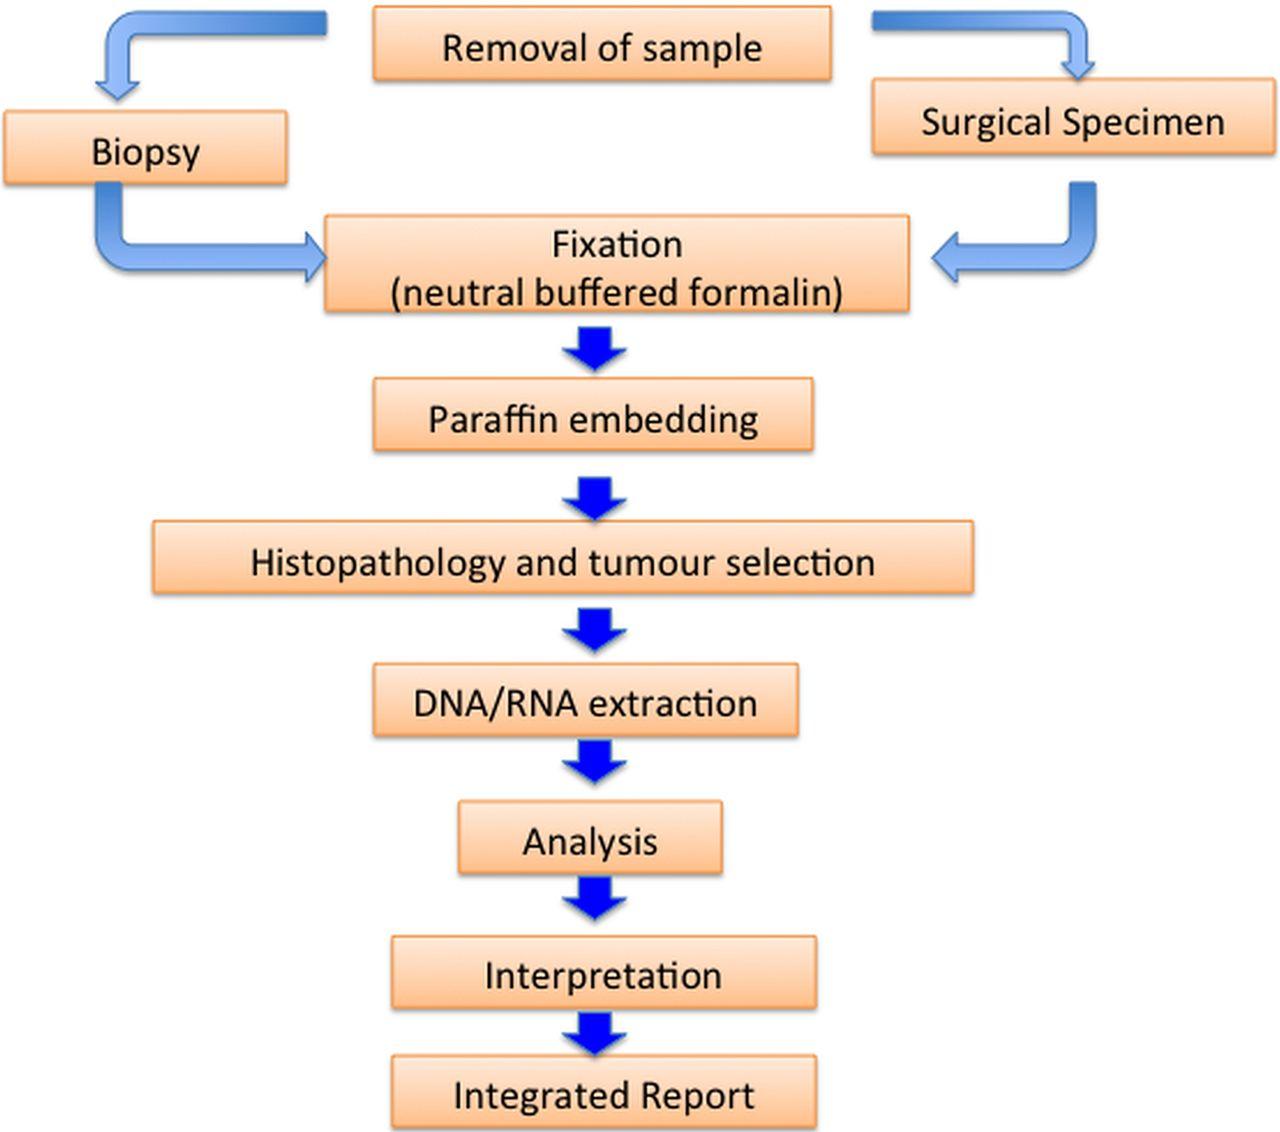 Guidance For Laboratories Performing Molecular Pathology